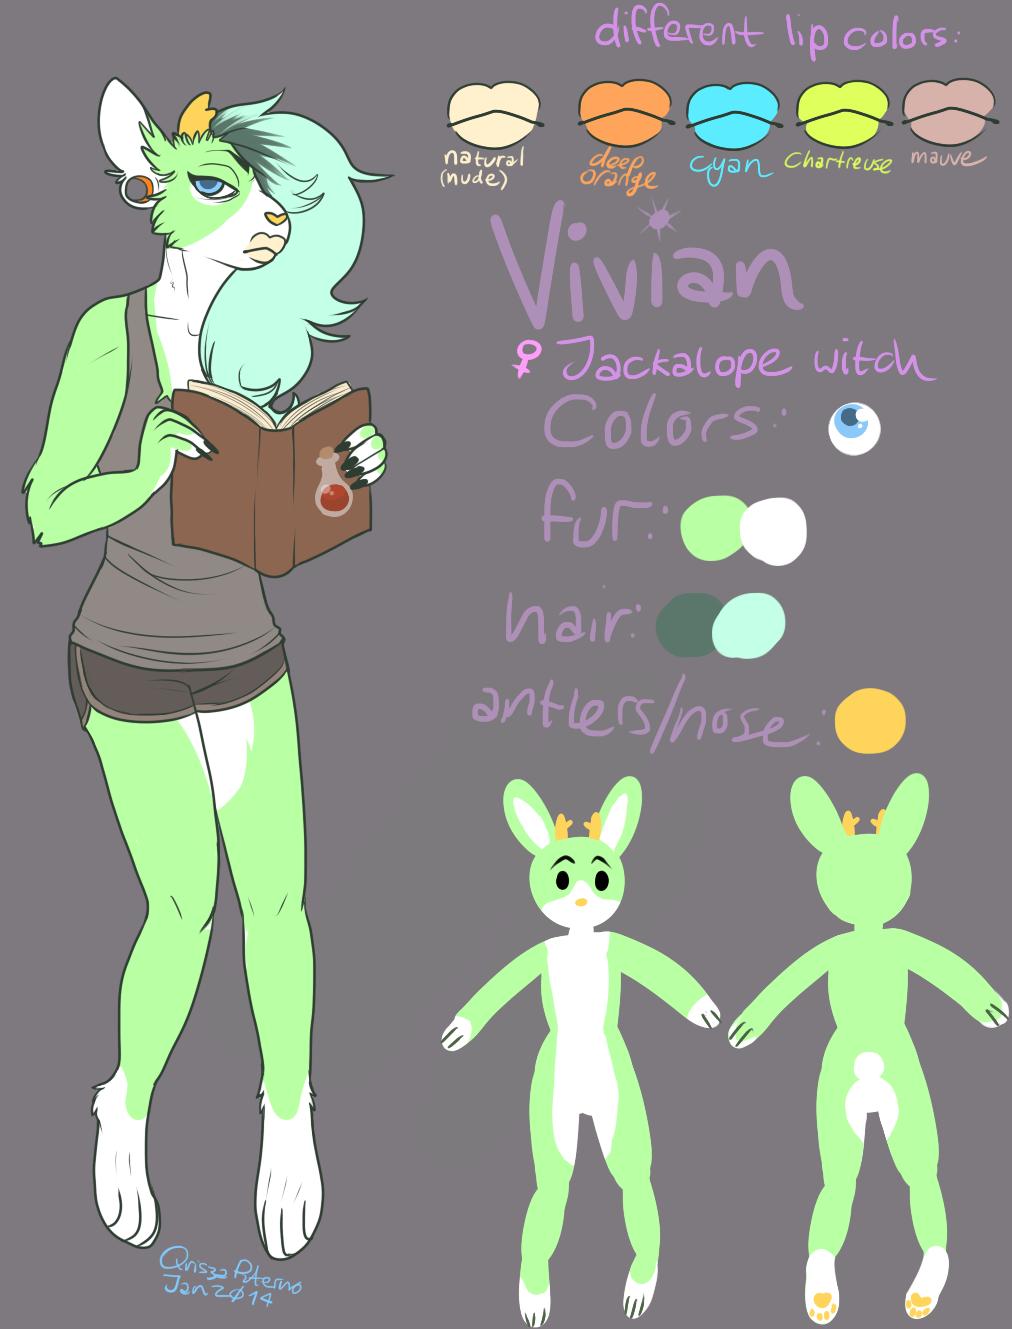 vivian ref